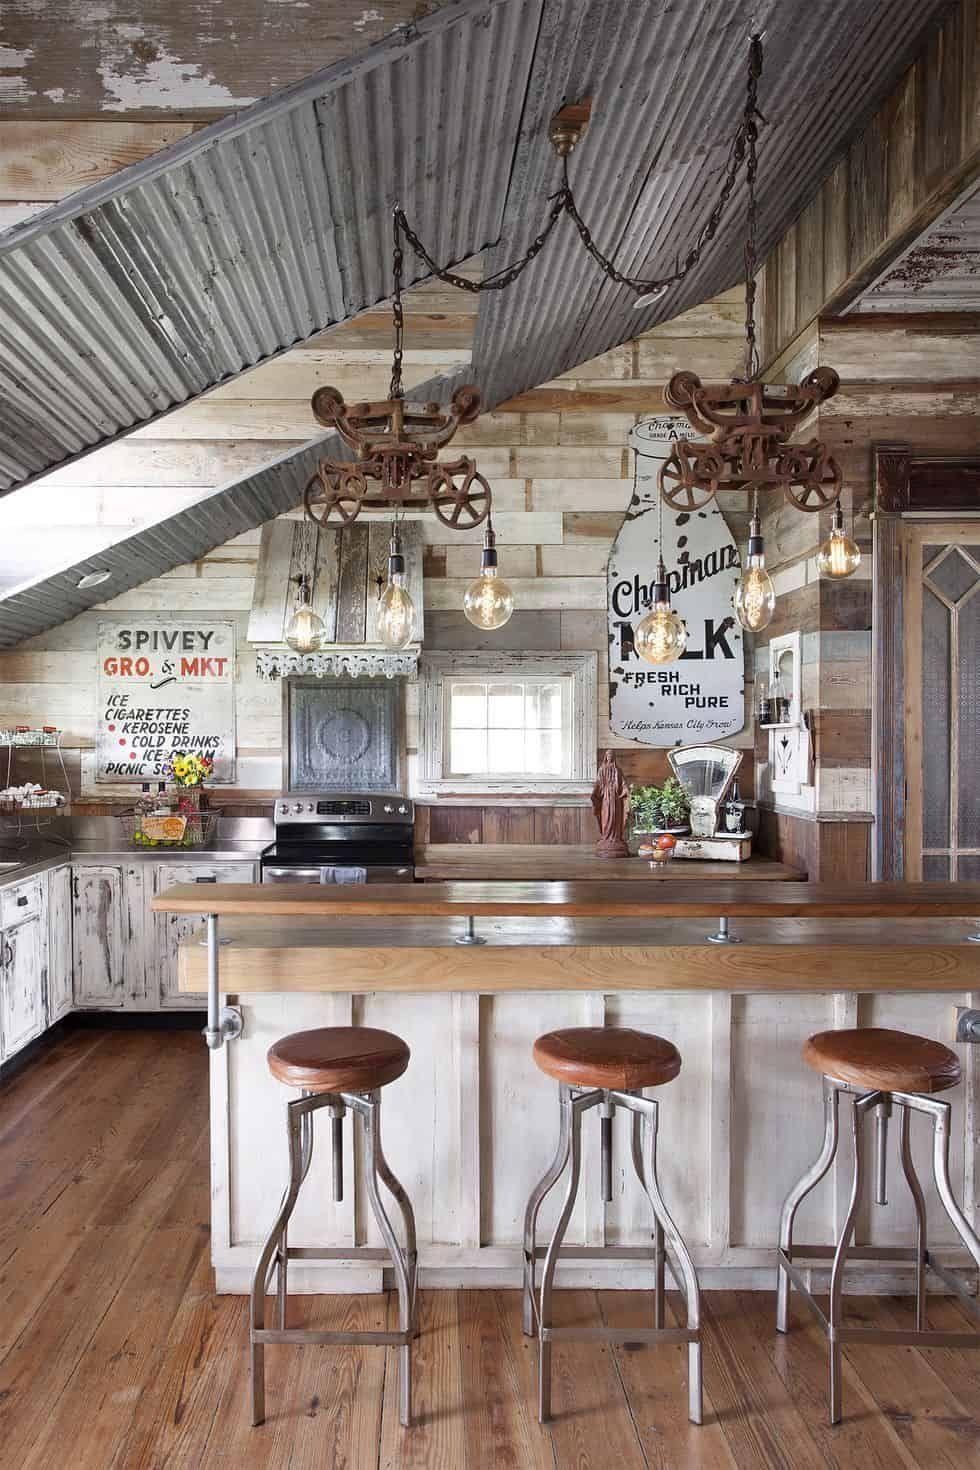 Rustic Farmhouse Kitchen With Galvanized Steel By Countryliving Com Rustic Farmhouse Kitchen Rustic Kitchen Decor Rustic Kitchen